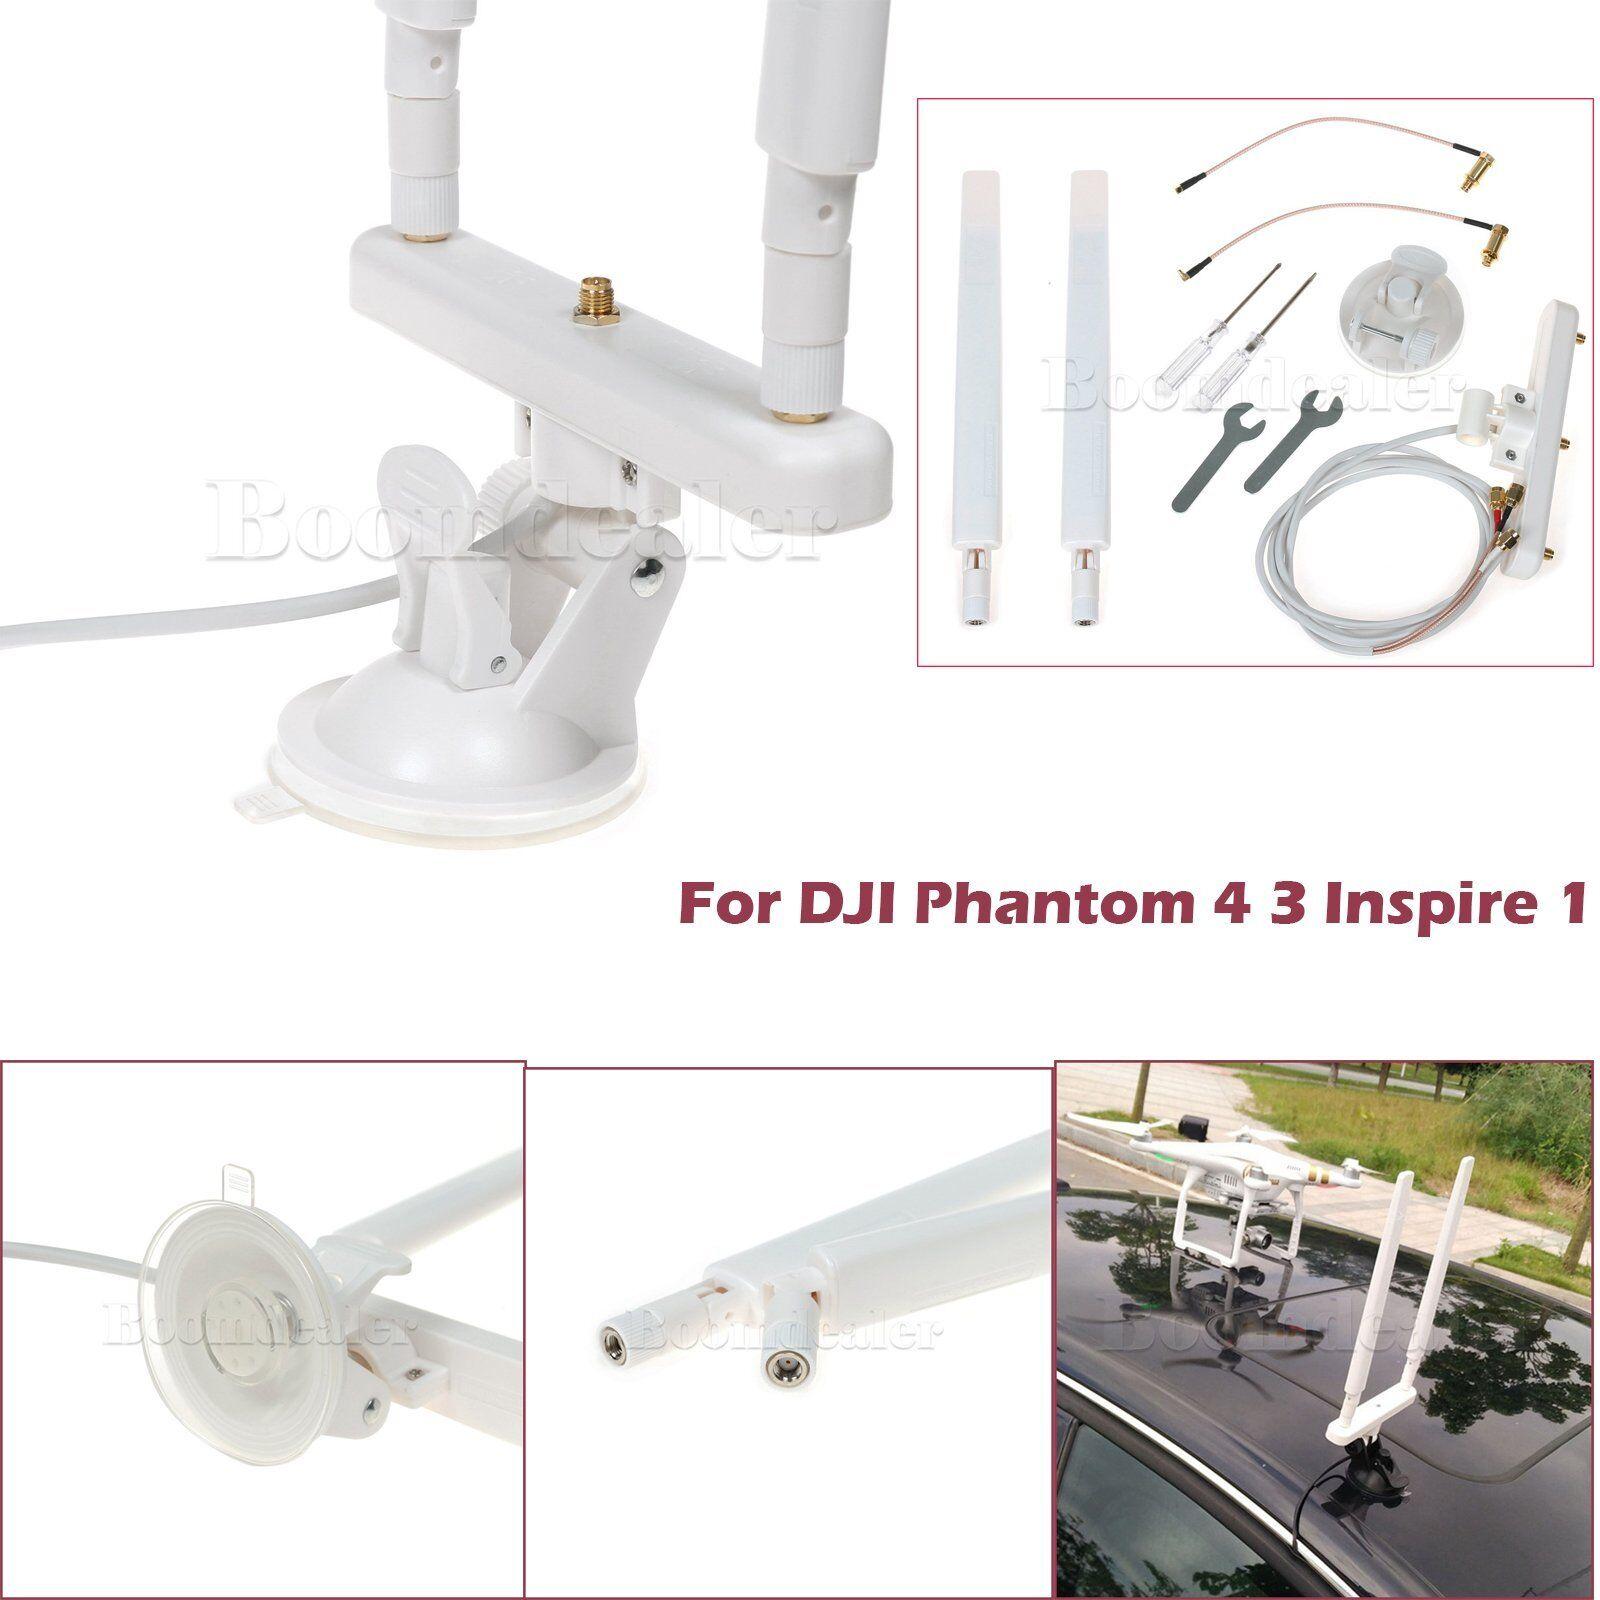 ARGtek 7dBi Omni Antenna Base Auto Kit Per DJI Phantom 4 3 Inspire 1 sostituzione